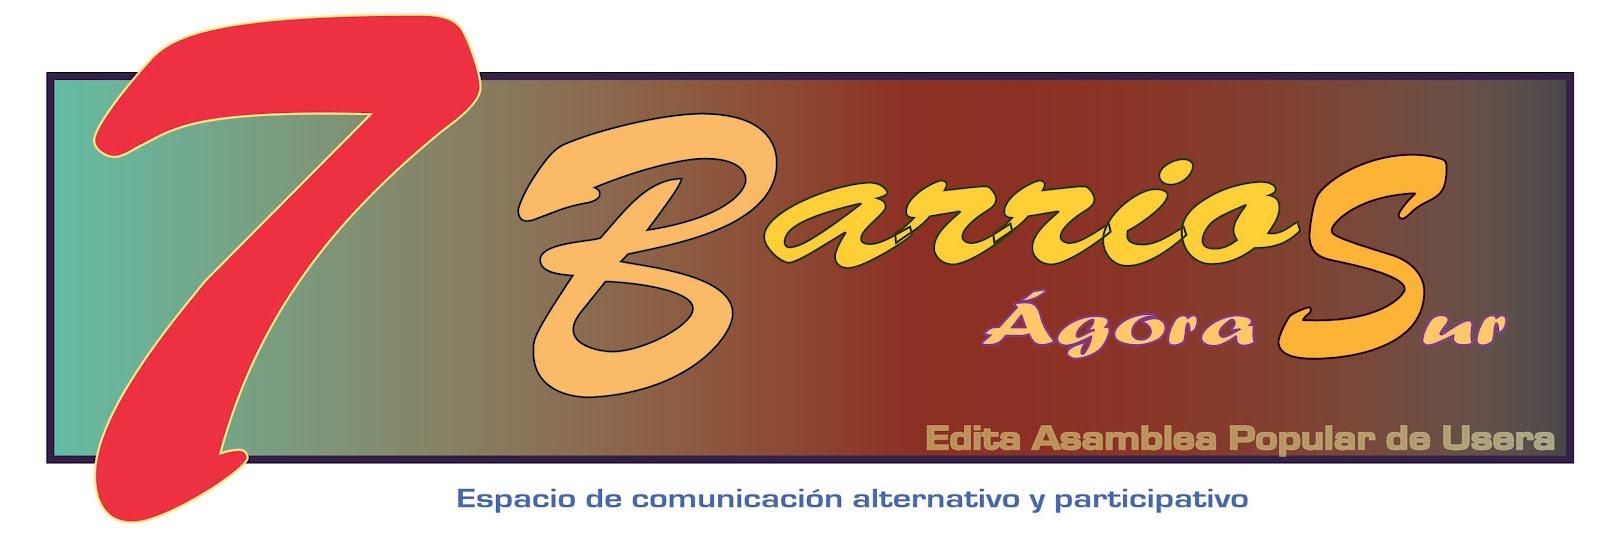 7 Barrios - Ágora Sur